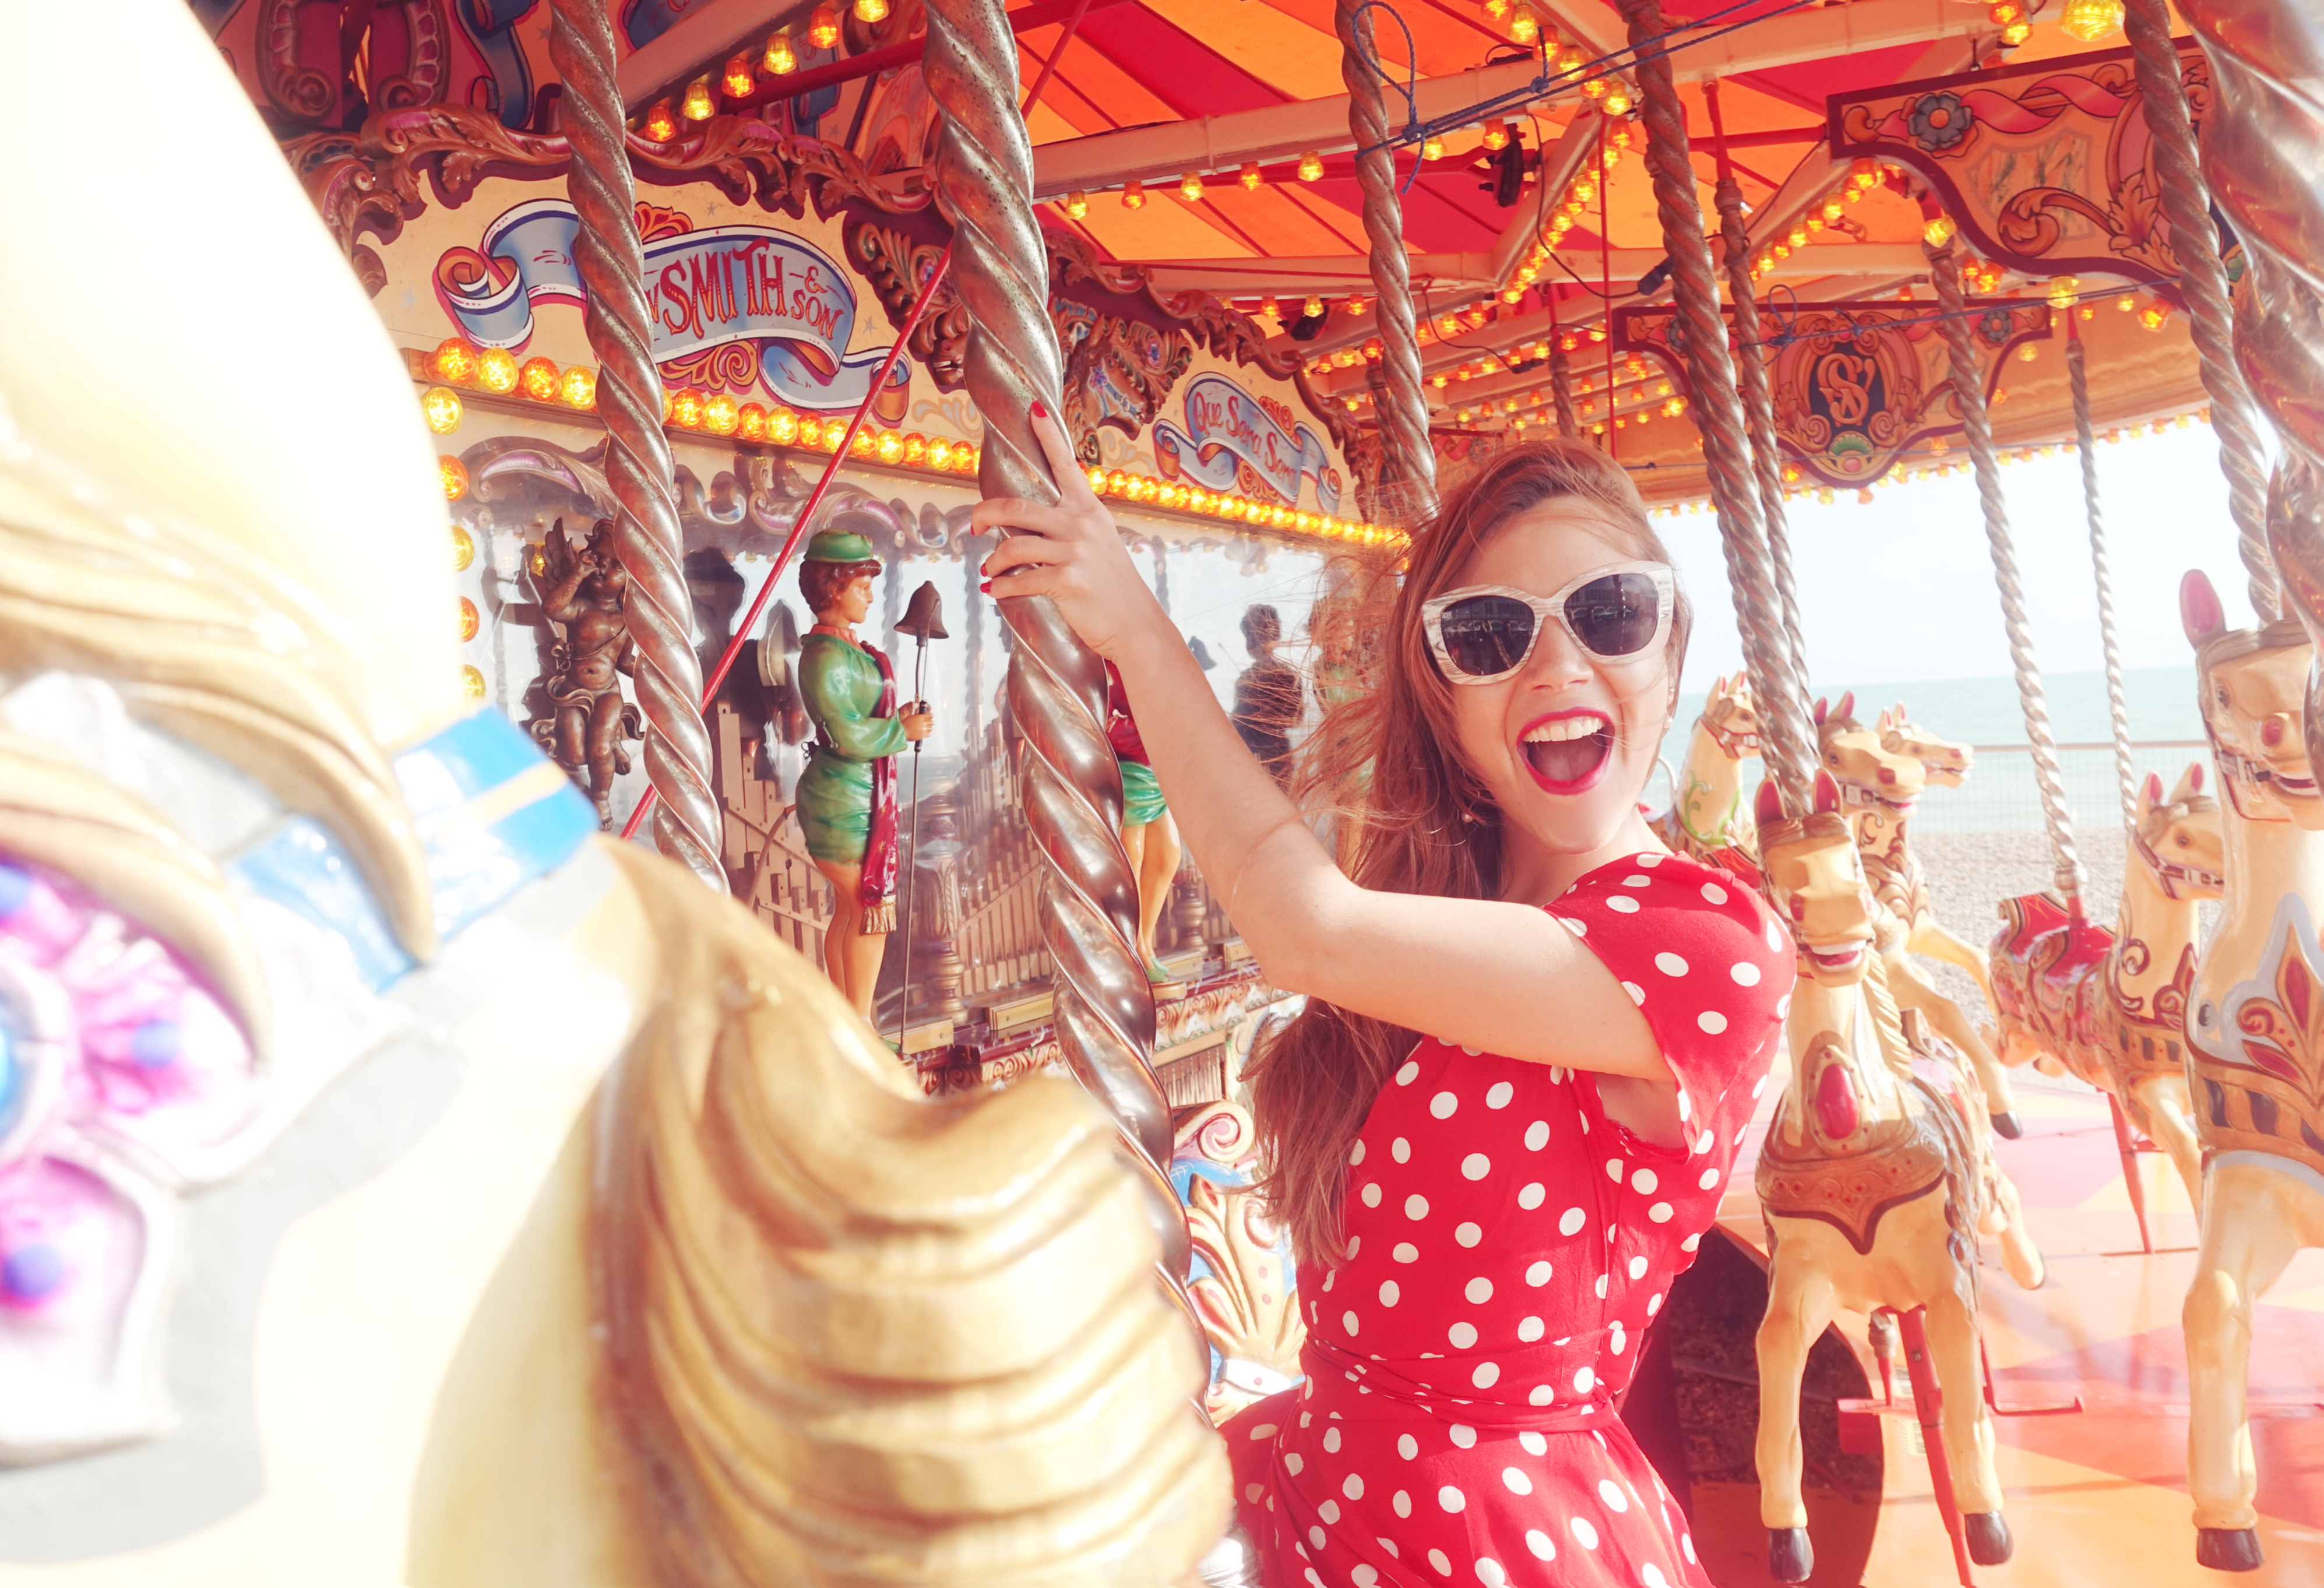 Que-ver-en-Brighton-fashion-travel-Chicadicta-influencer-uk-PiensaenChic-polka-dot-dress-floryday-Chic-adicta-Piensa-en-Chic